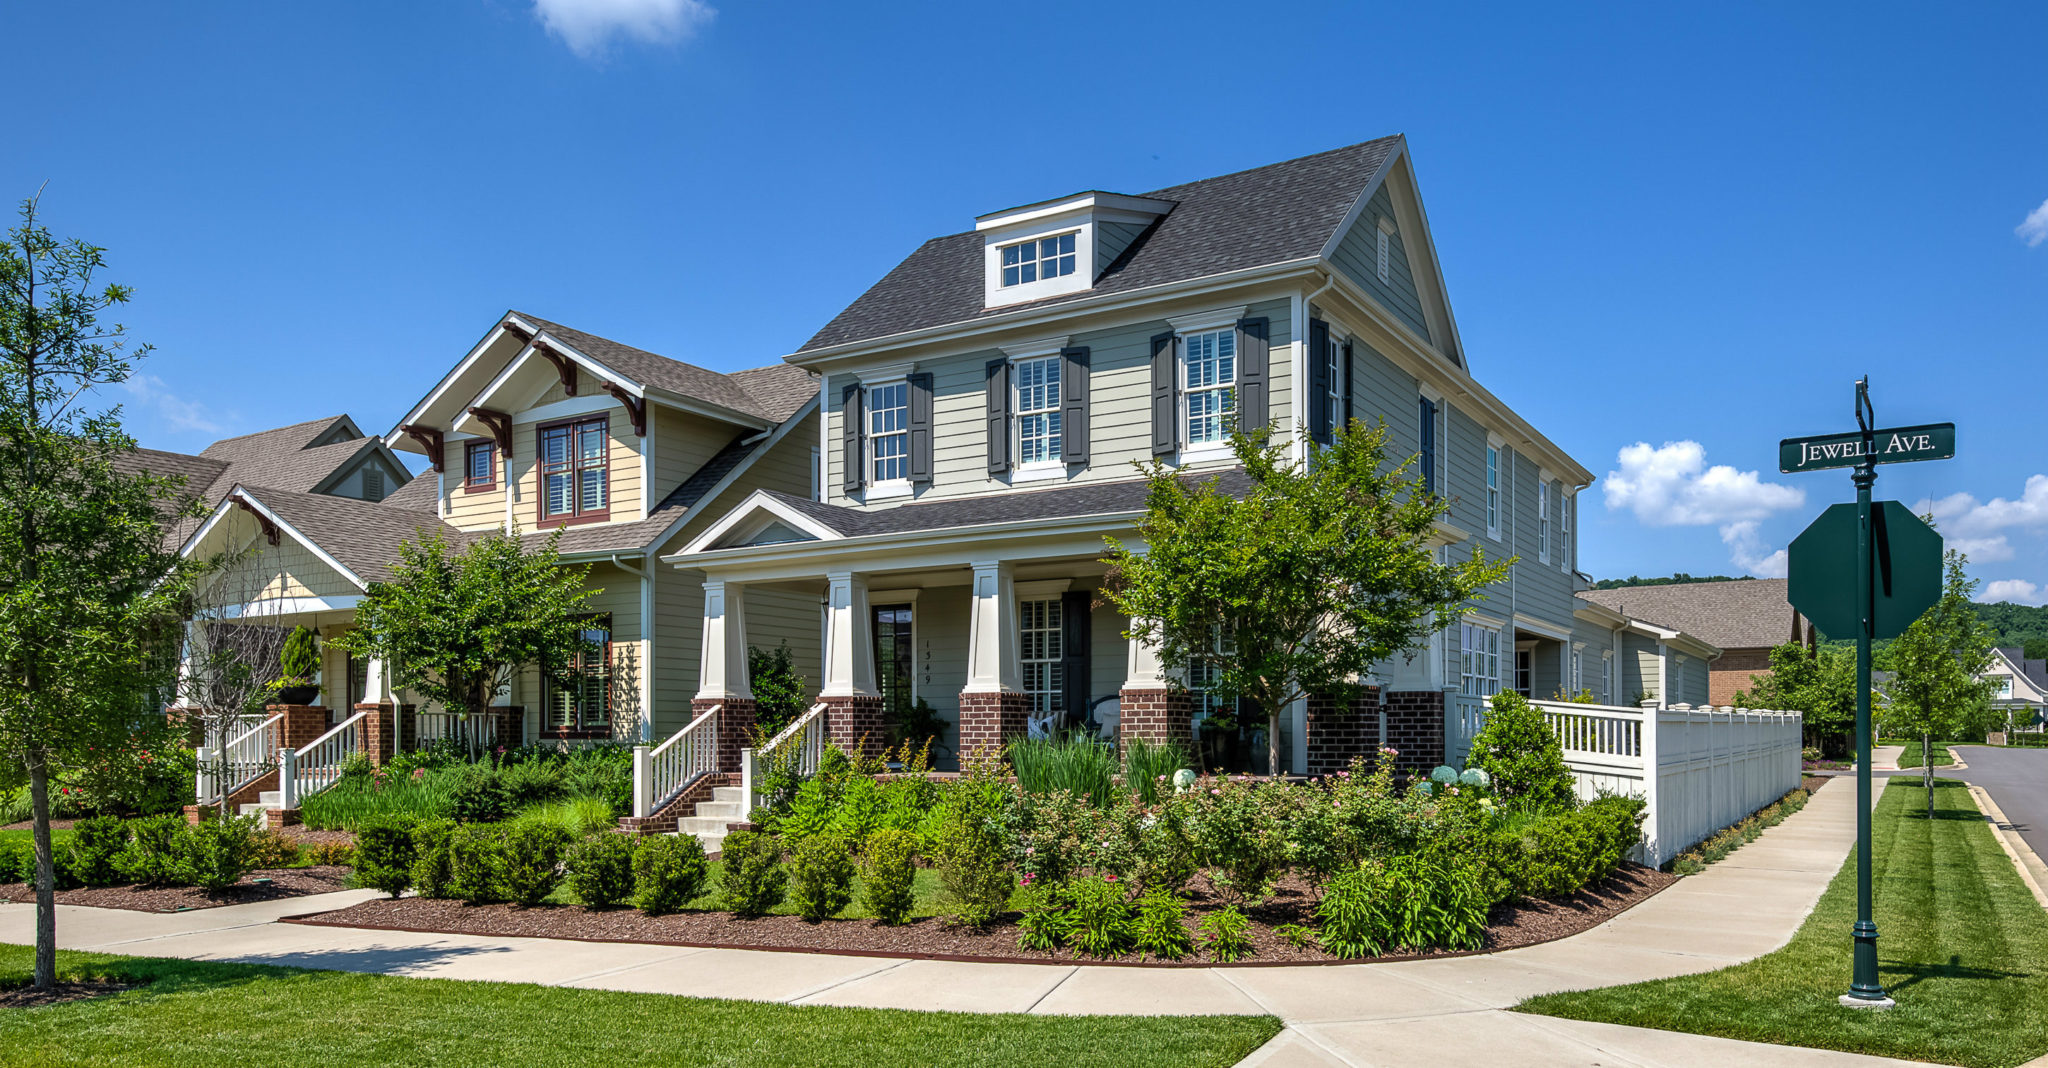 Historic Homes For Sale Nashville Tn